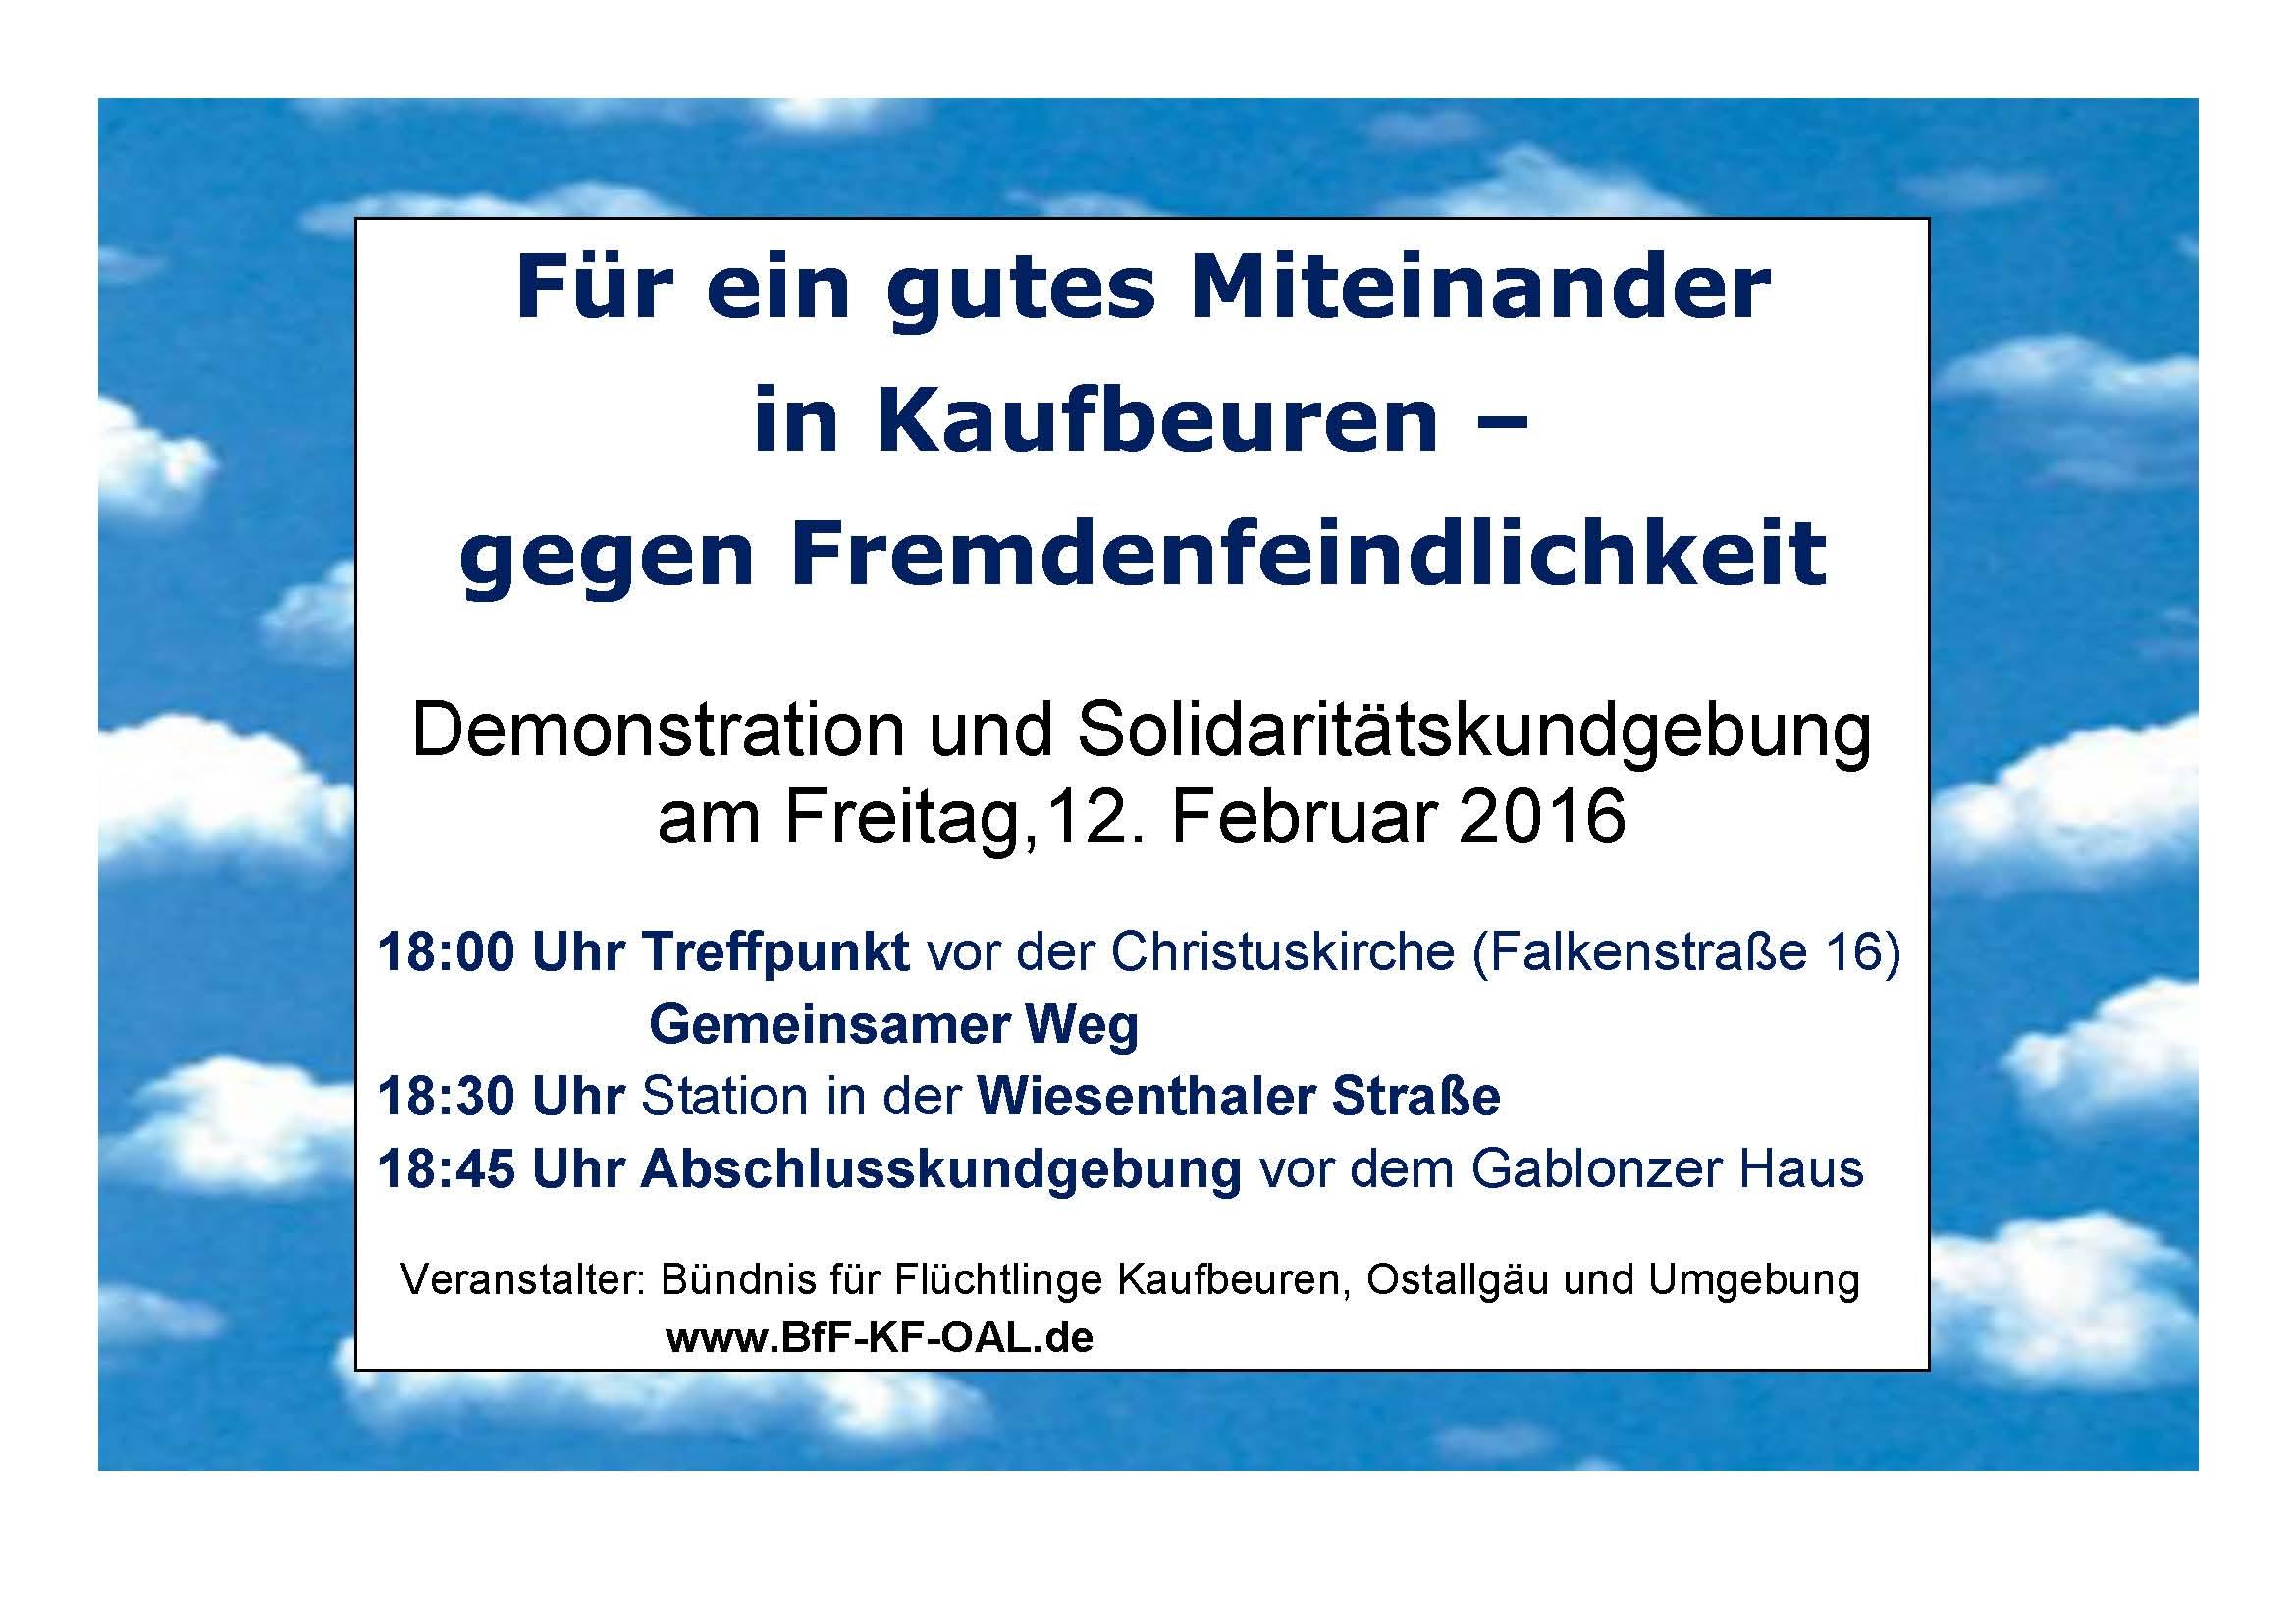 Demo und Solidaritätsbekundung 12.02.16